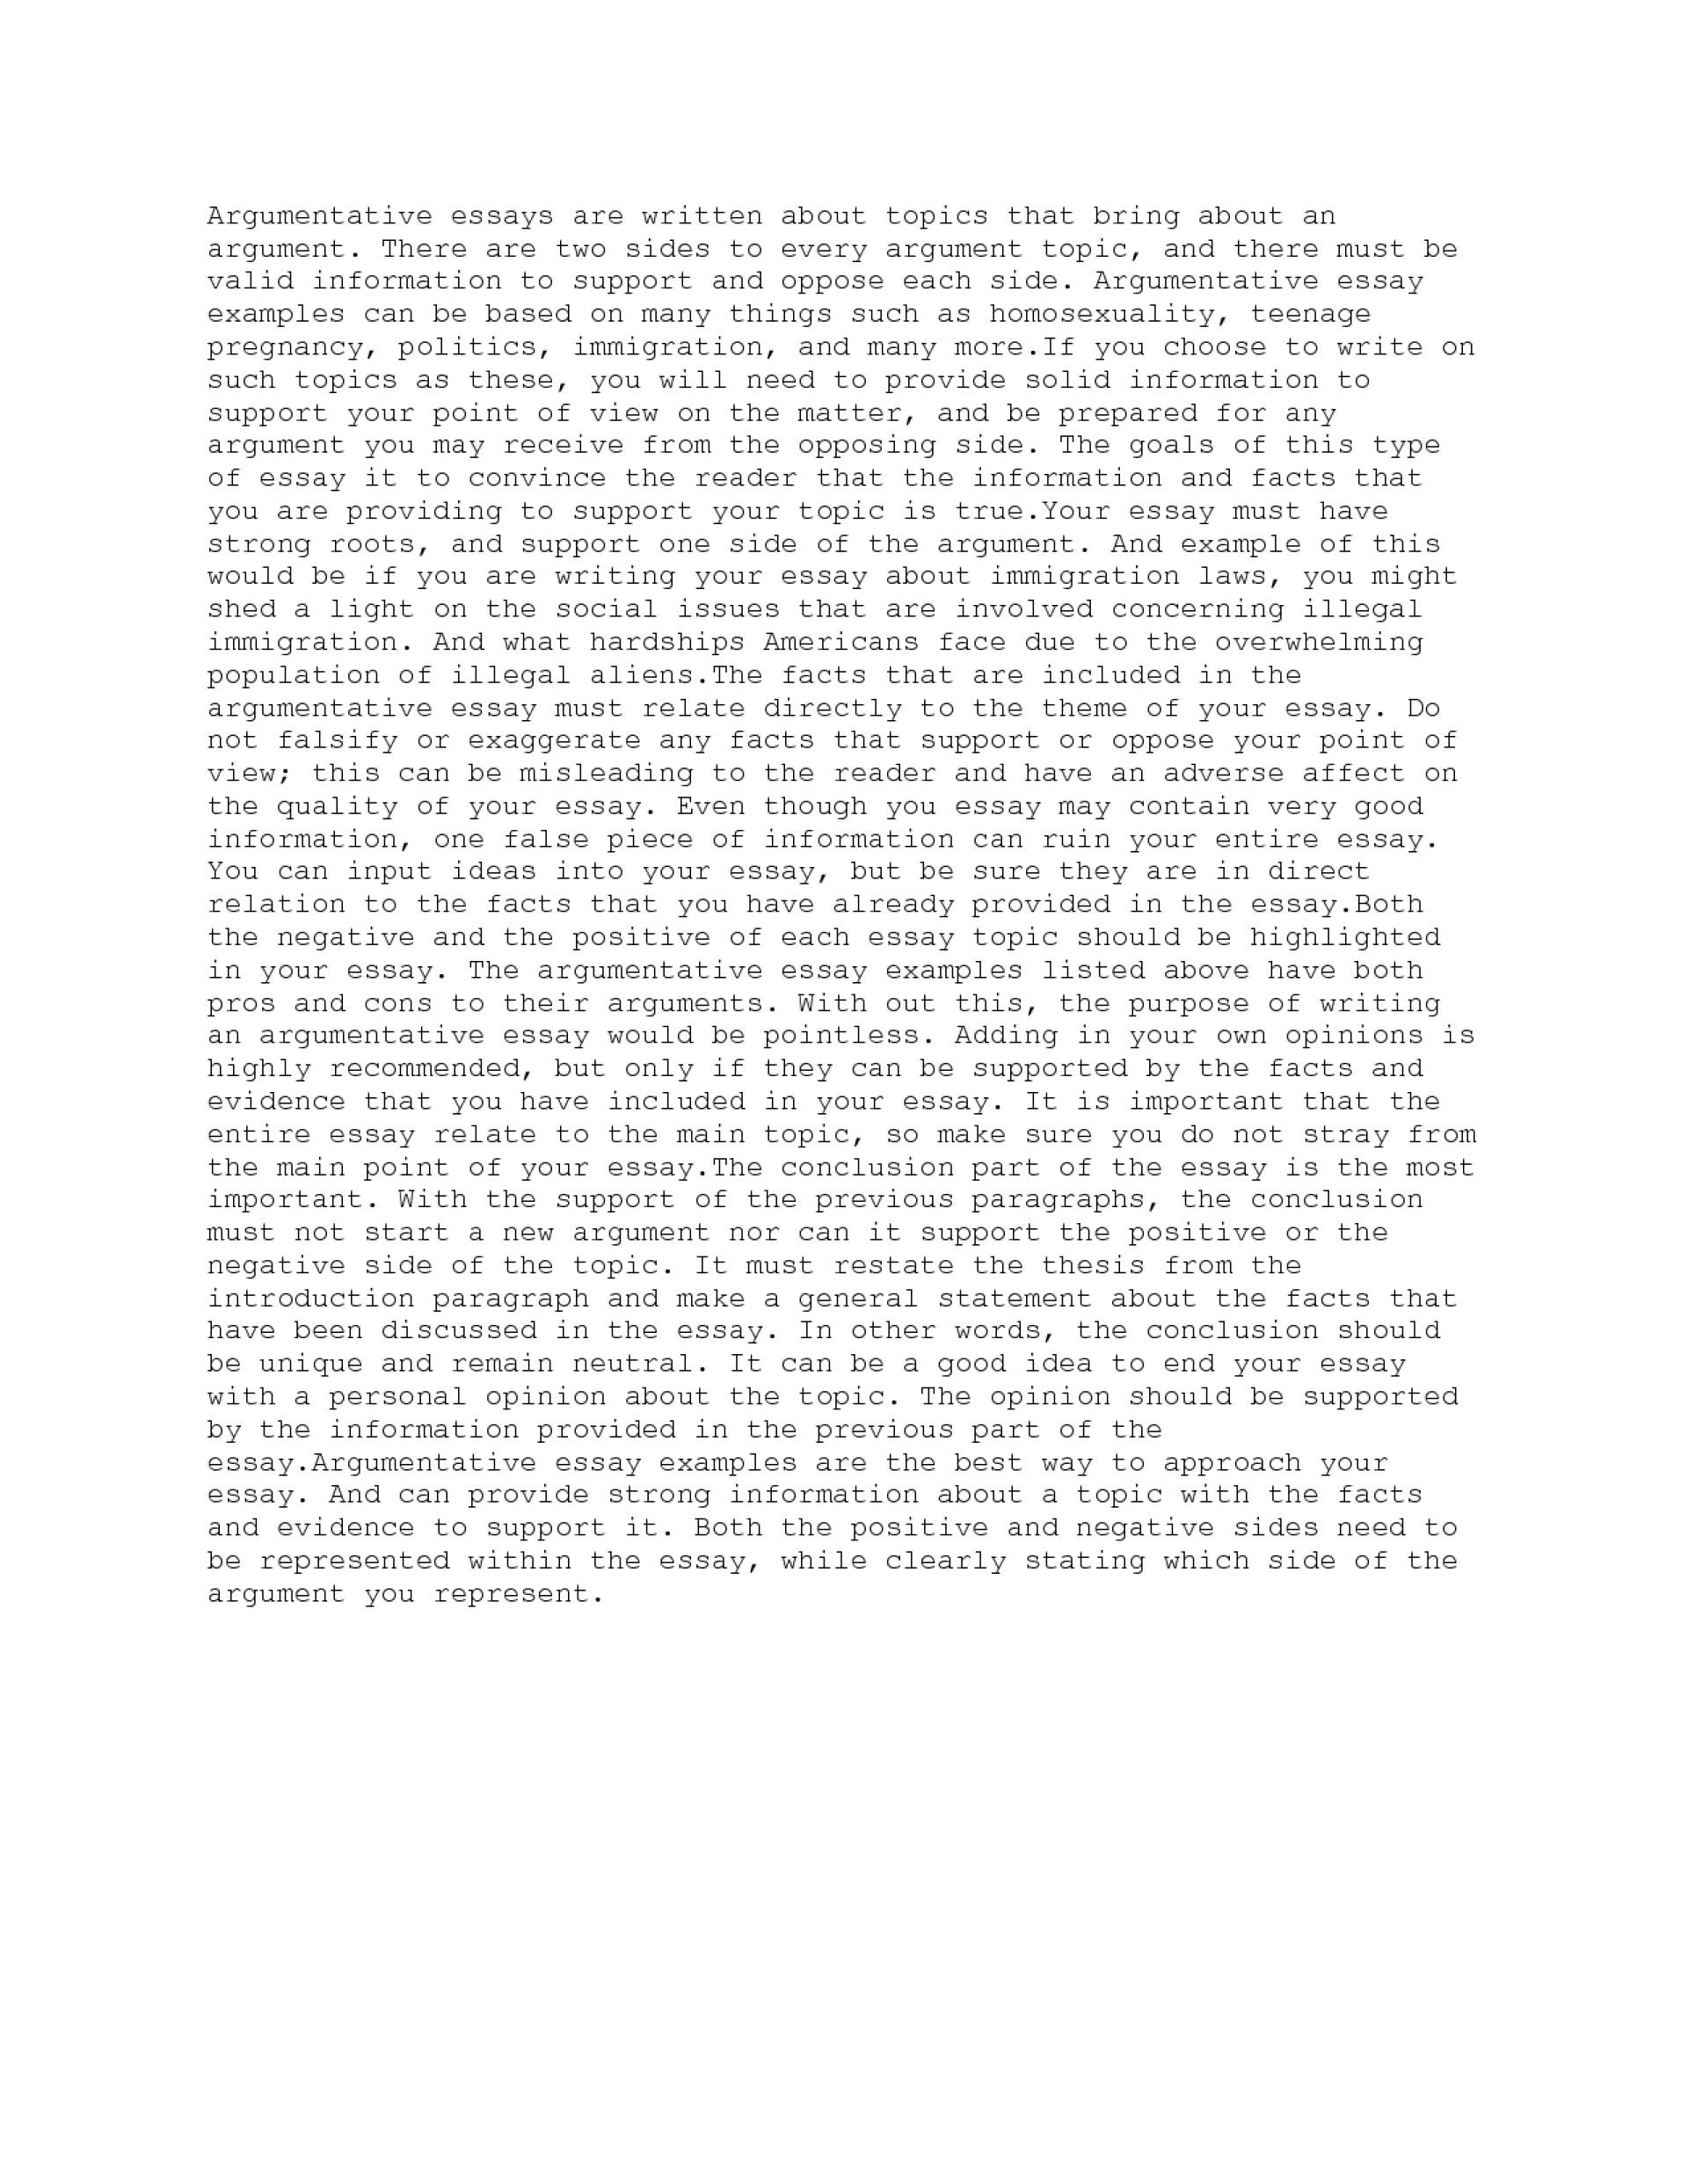 014 Qv3jjq5wkt Essay Example Good Topics For Wonderful A Discursive Interesting Higher Persuasive 1920